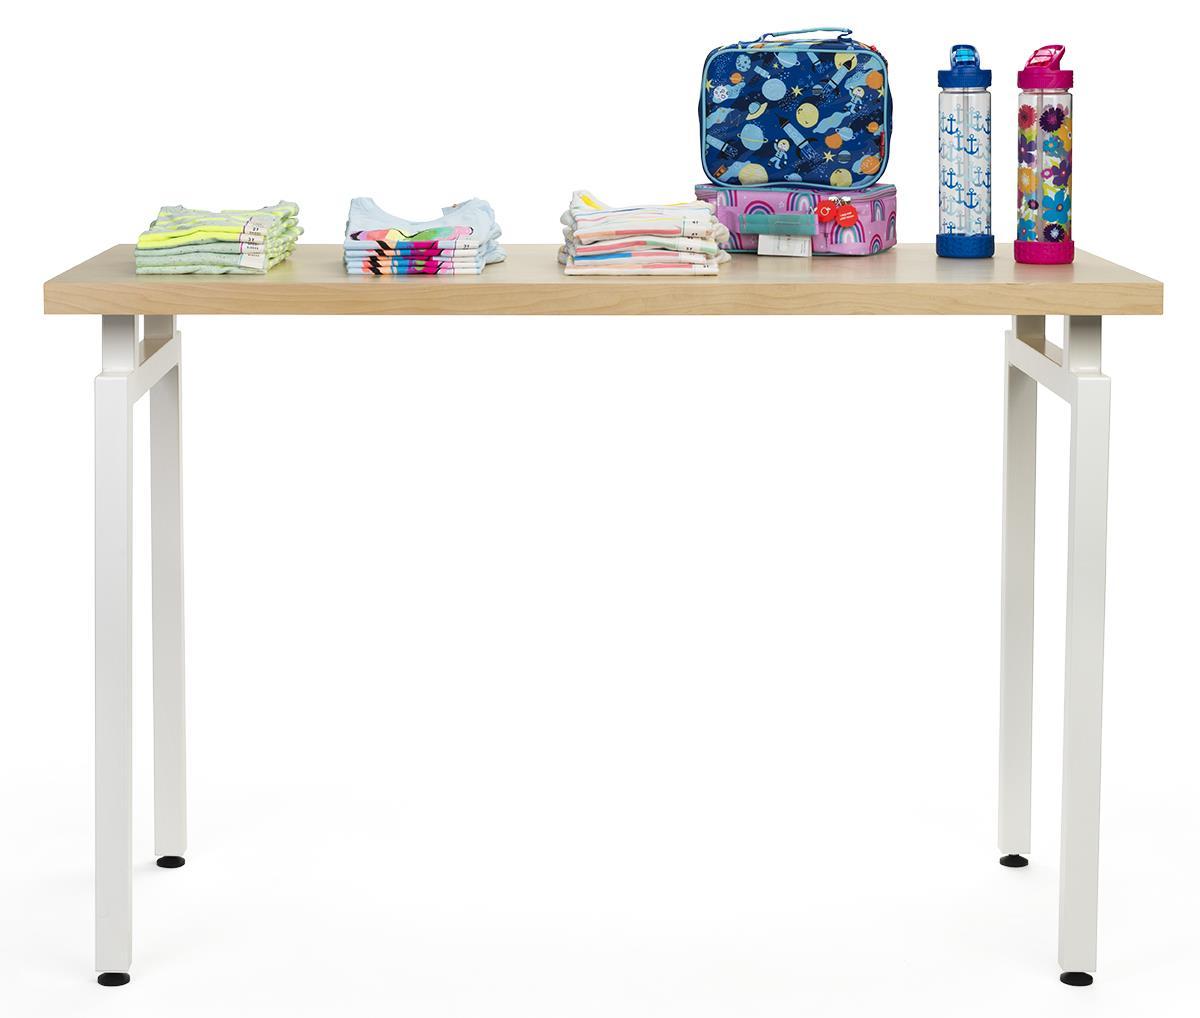 Groovy Wooden Retail Table With White Steel Legs Maple Uwap Interior Chair Design Uwaporg